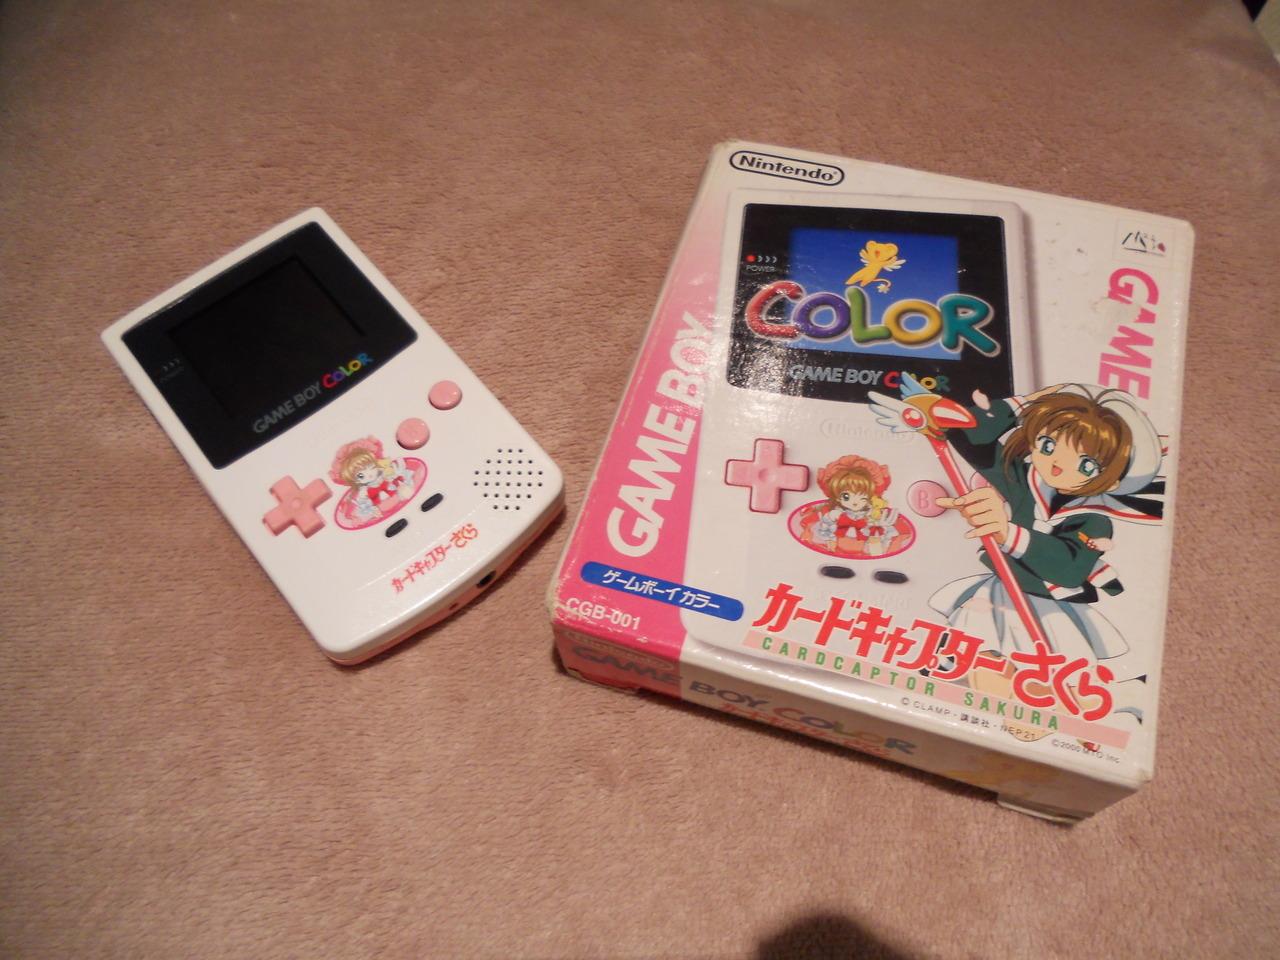 [RCH] Consoles SAKURA / Hello Kitty Tumblr_m8zhn4jGGQ1rrmwbdo1_1280